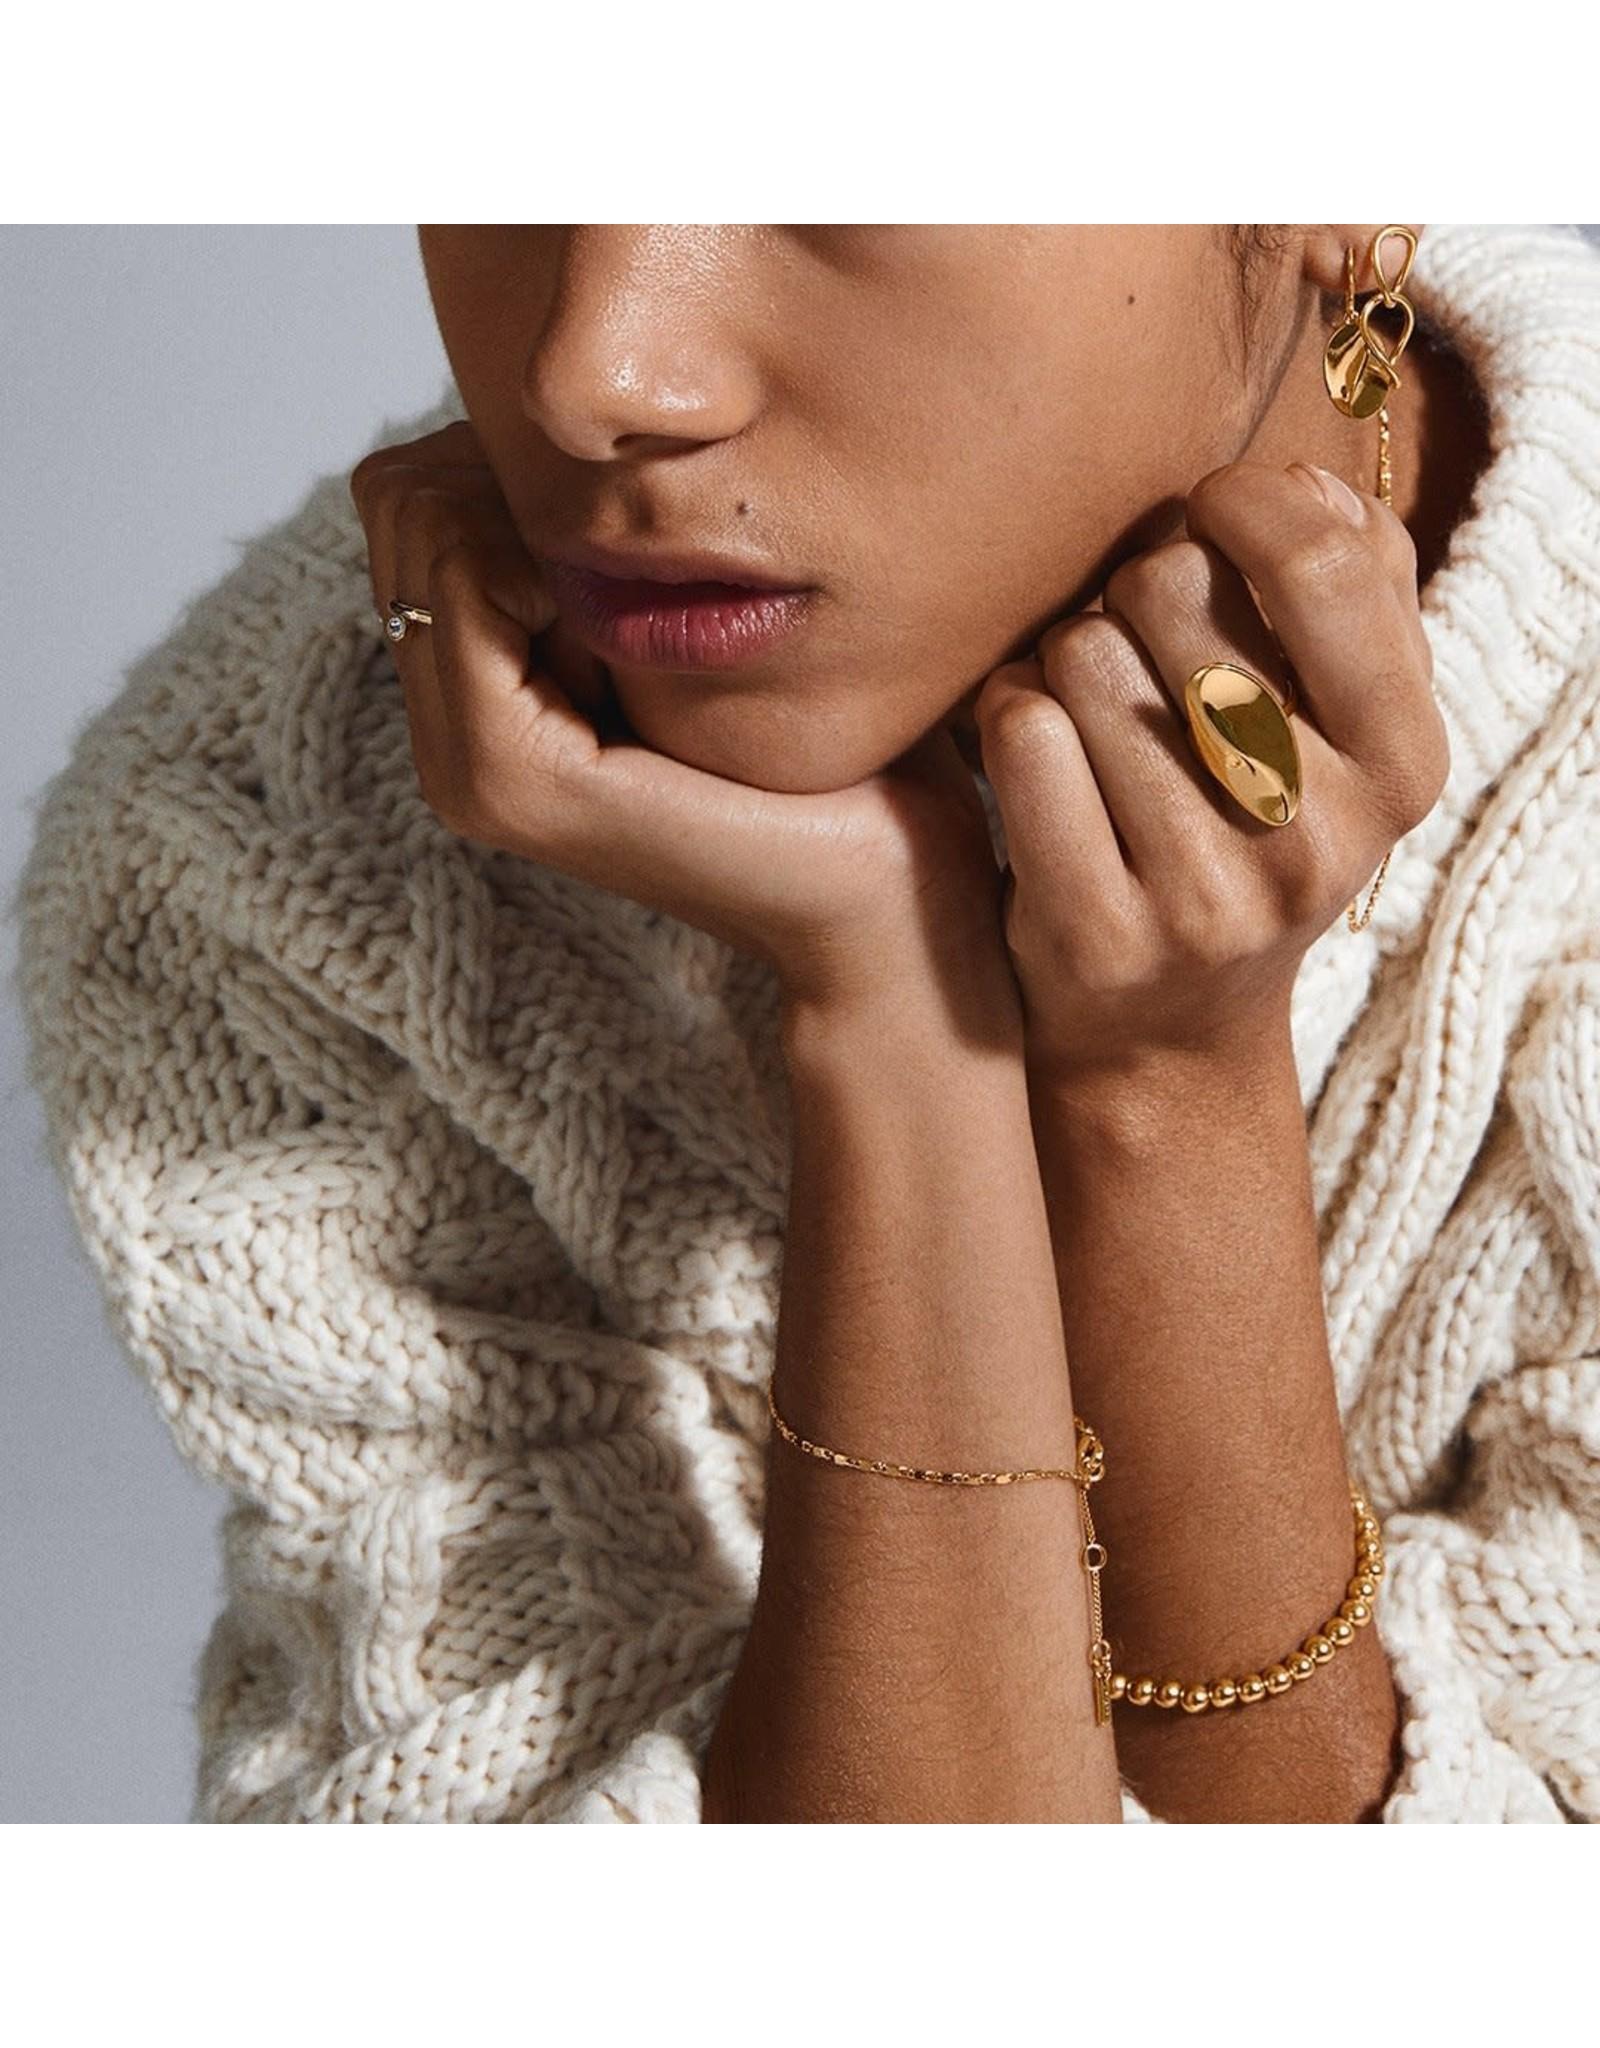 Pilgrim Pilgrim Nika Earrings Gold Plated